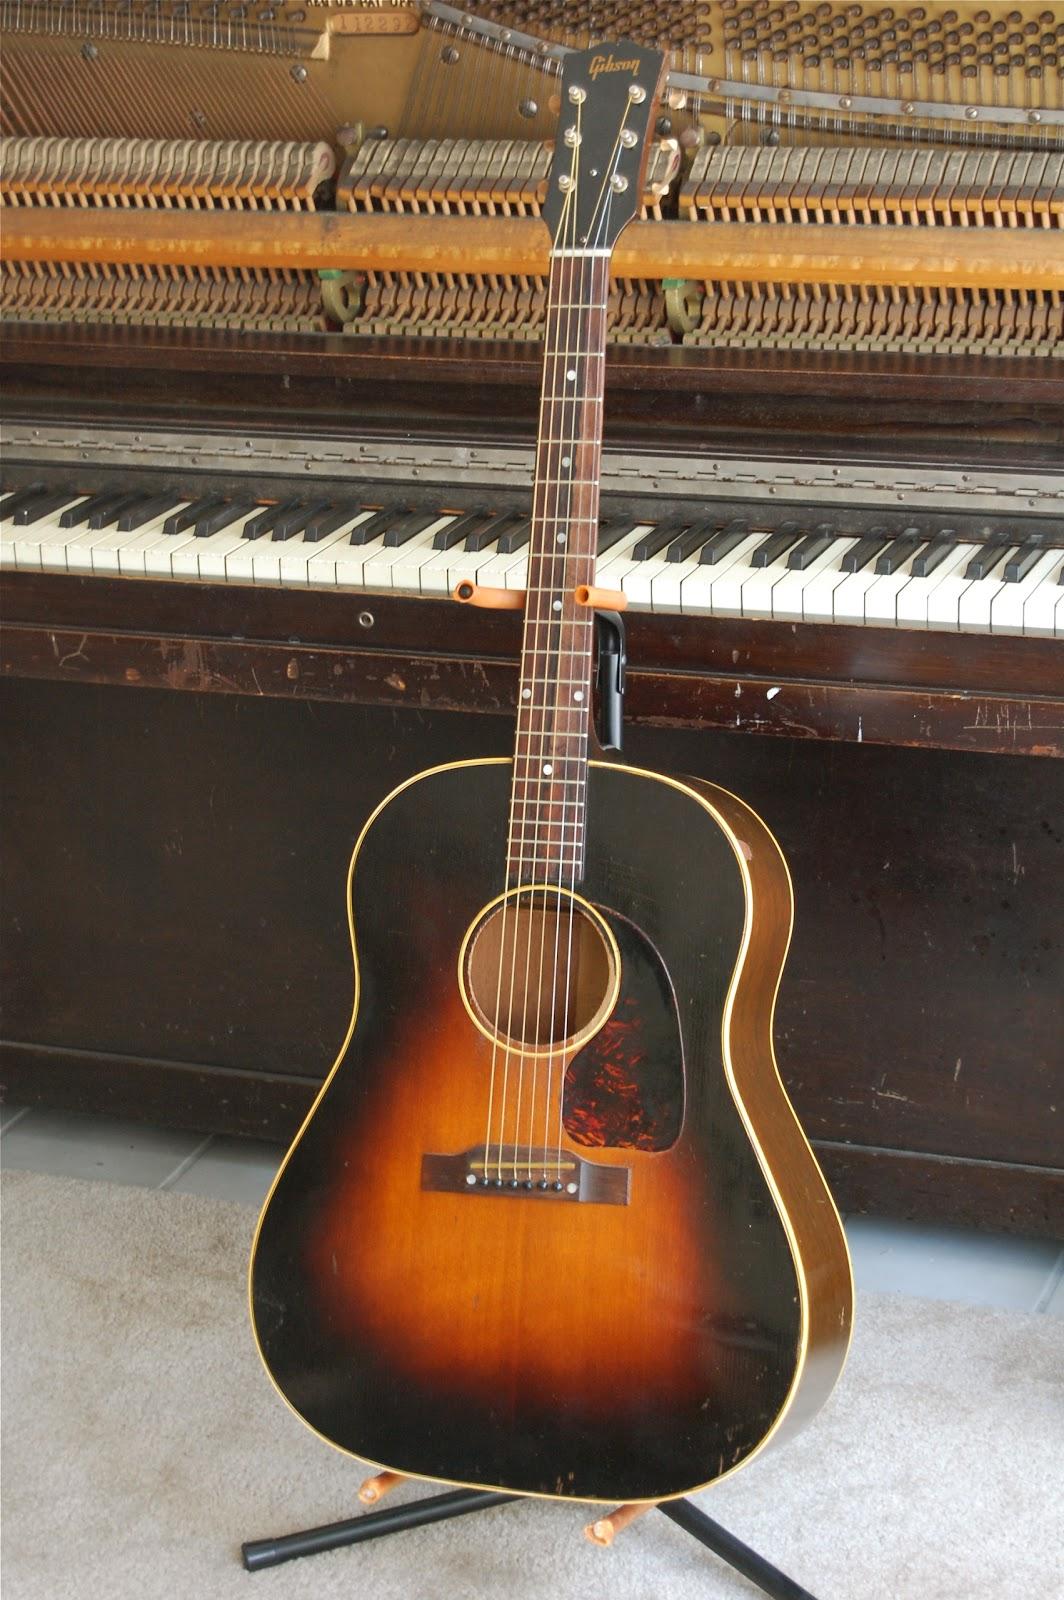 galasso guitars 1953 gibson j 45 nicknamed the workhorse. Black Bedroom Furniture Sets. Home Design Ideas